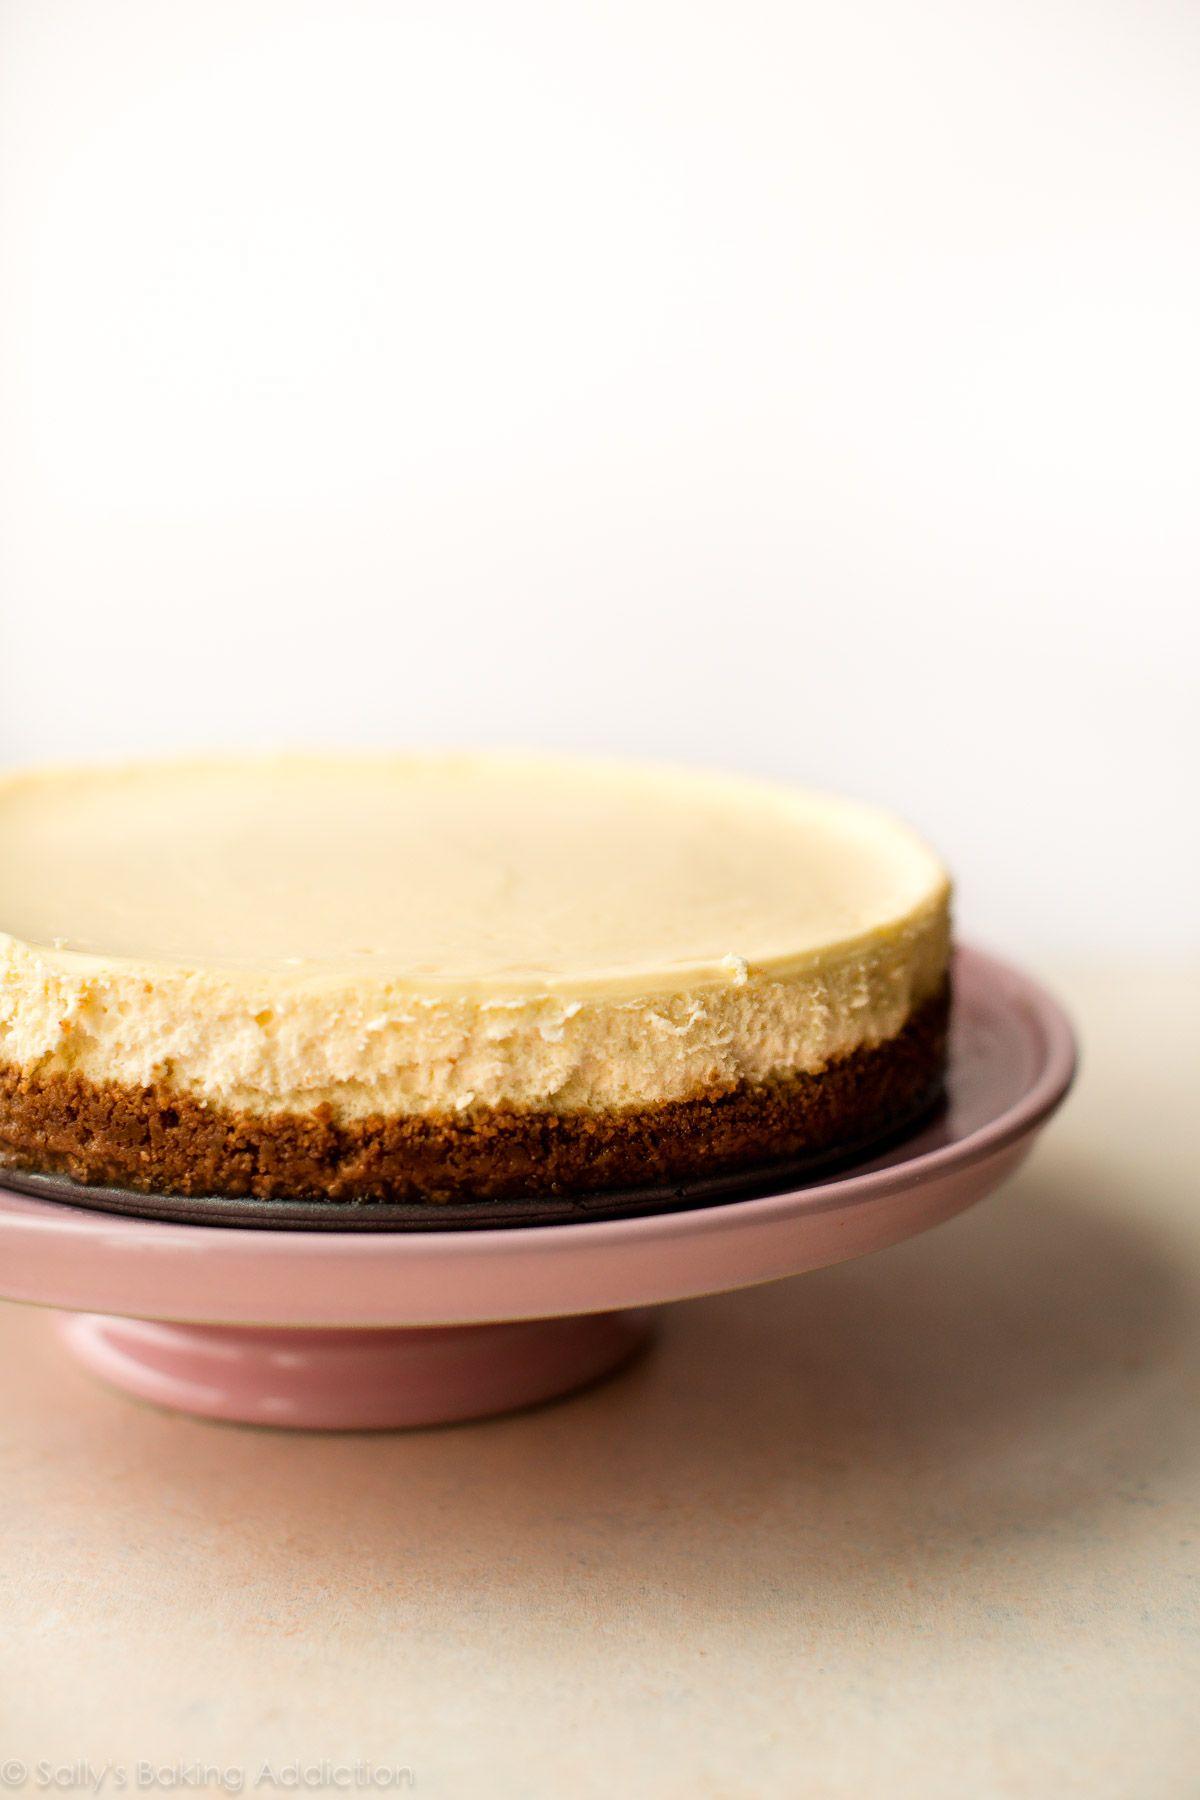 Classic Cheesecake Recipe   Sally's Baking Addiction